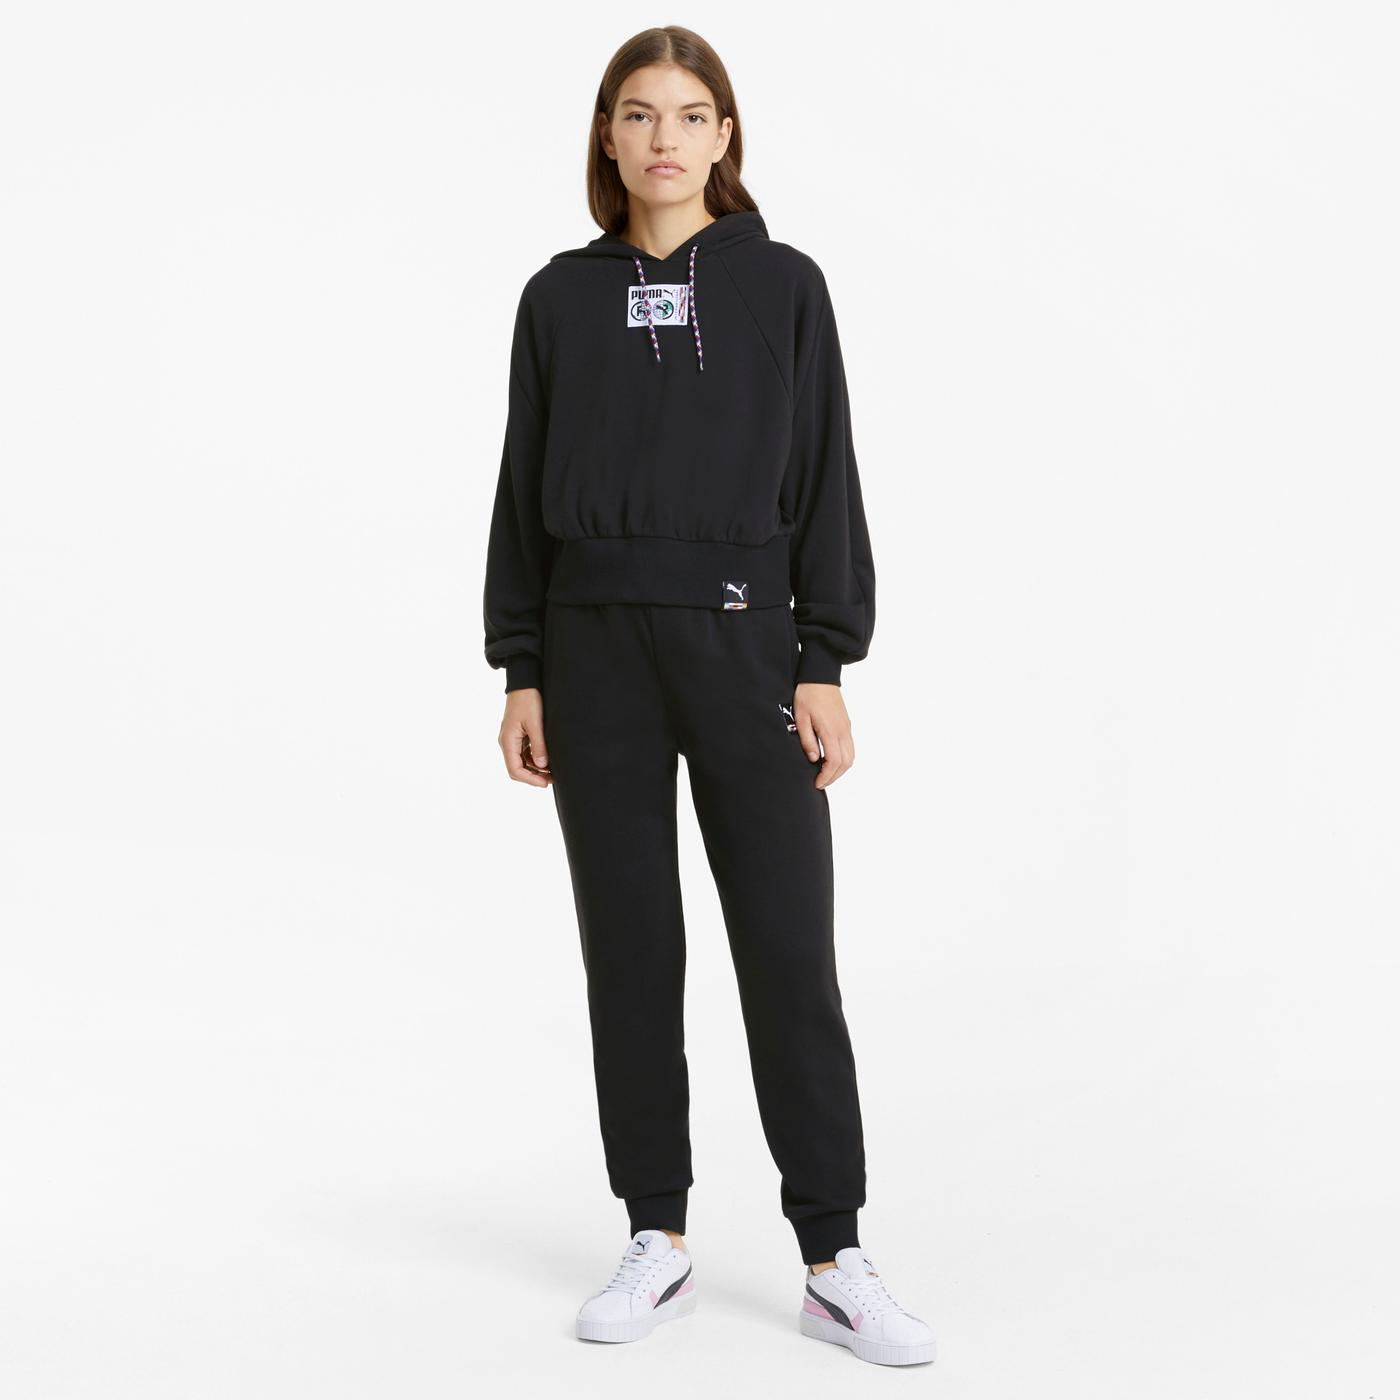 Puma International Knitted Kadın Siyah Eşofman Altı